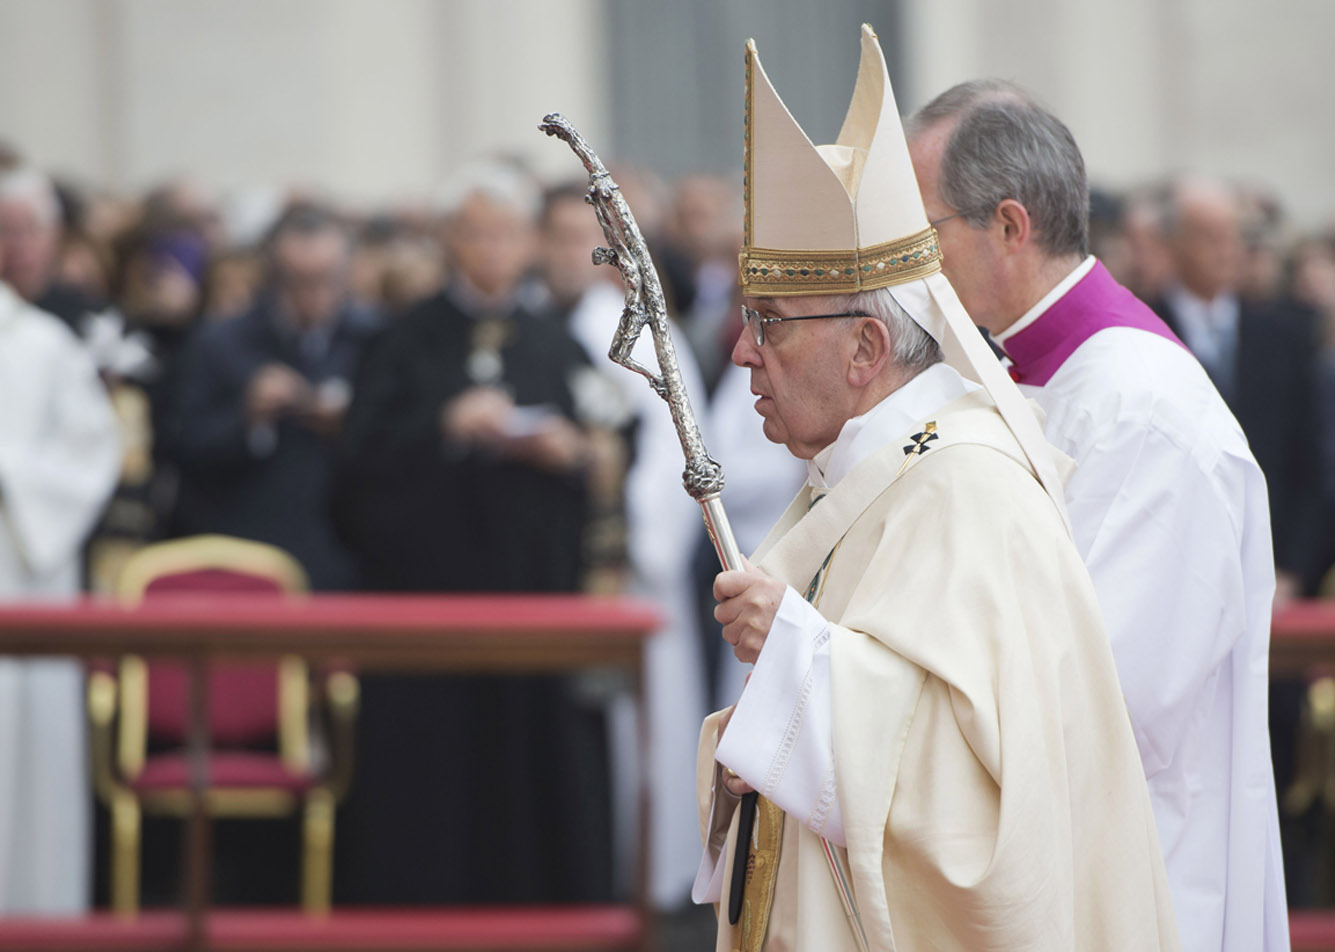 Em missa de Natal, Papa fala de indiferença e consumo